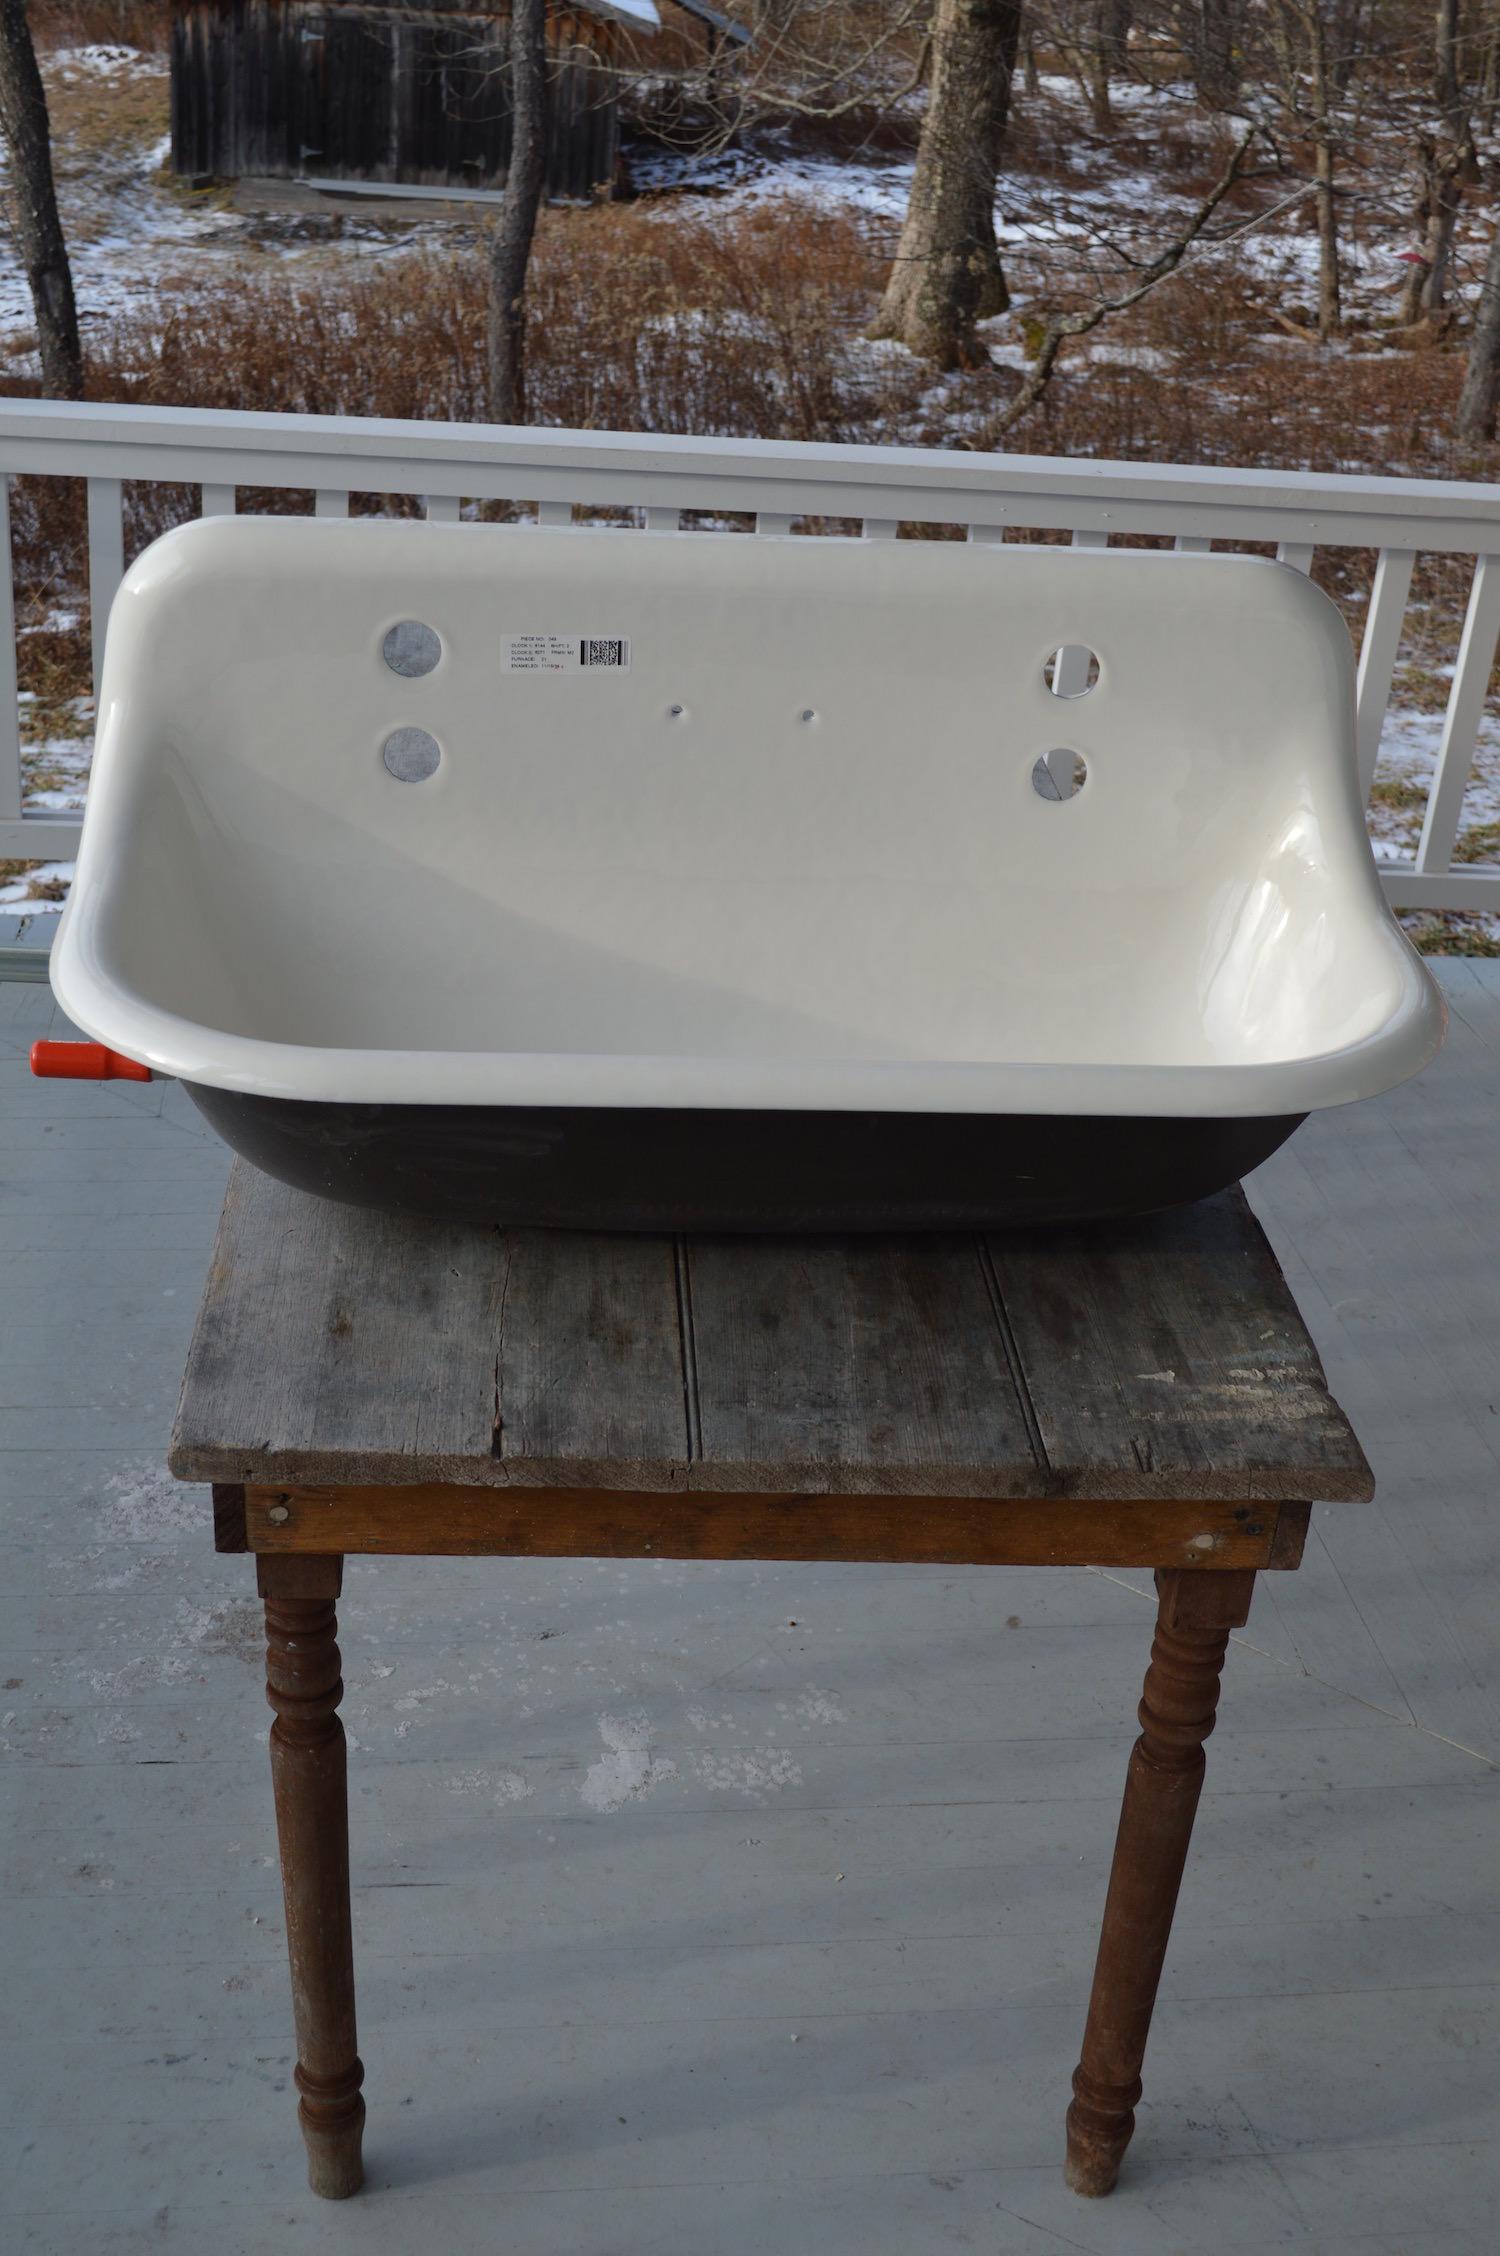 2ll winter - sink.jpg